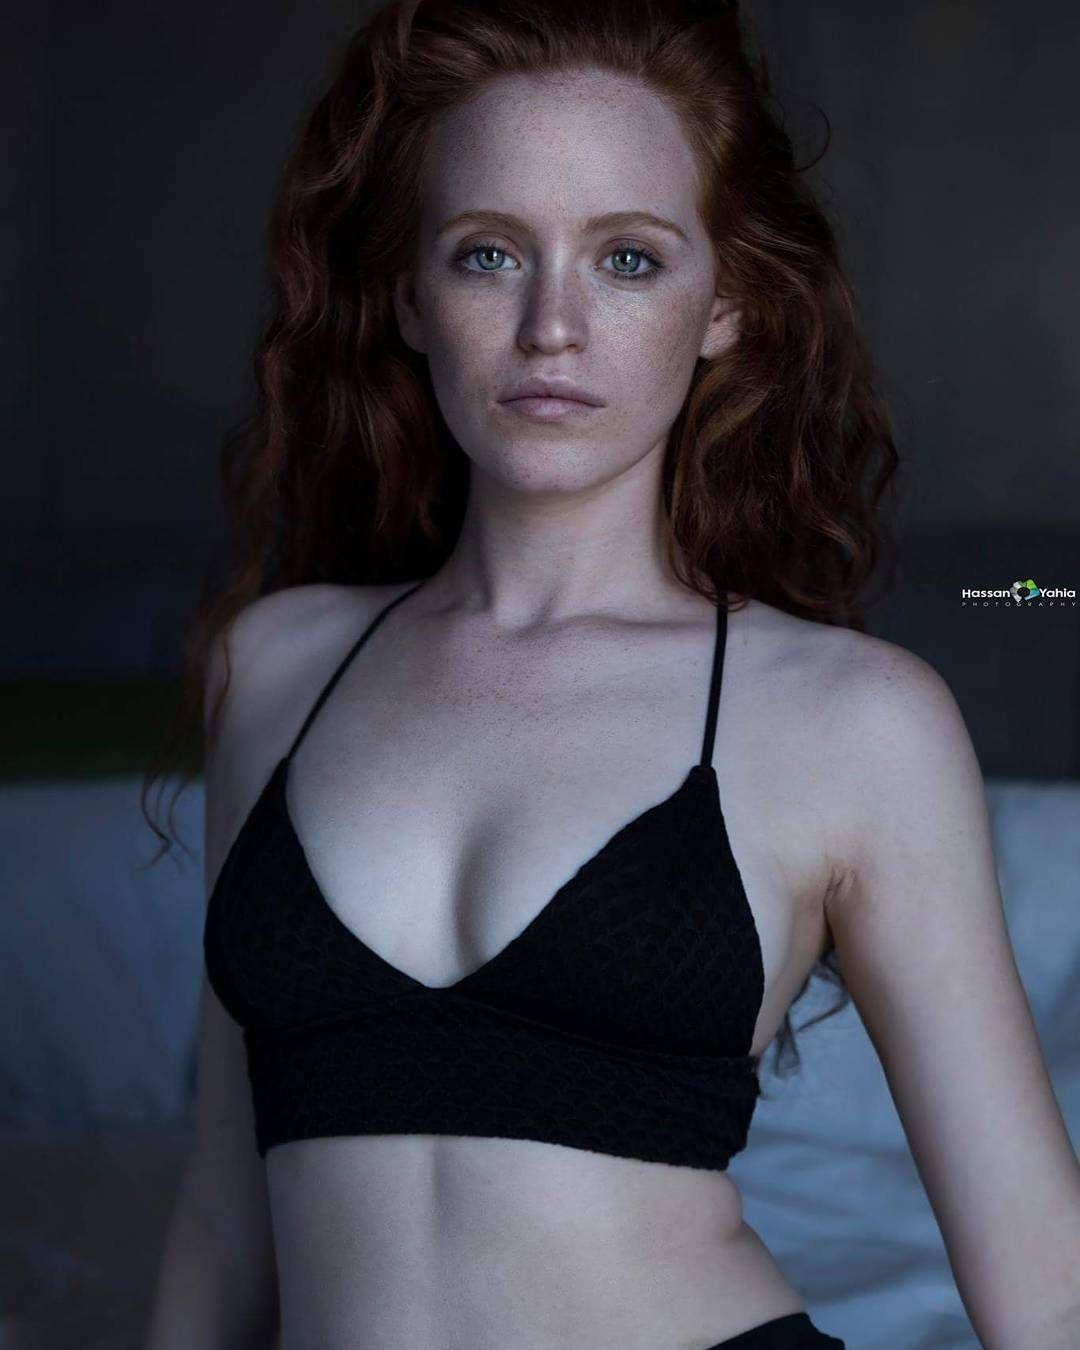 Сексуальная рыжая девочка секс